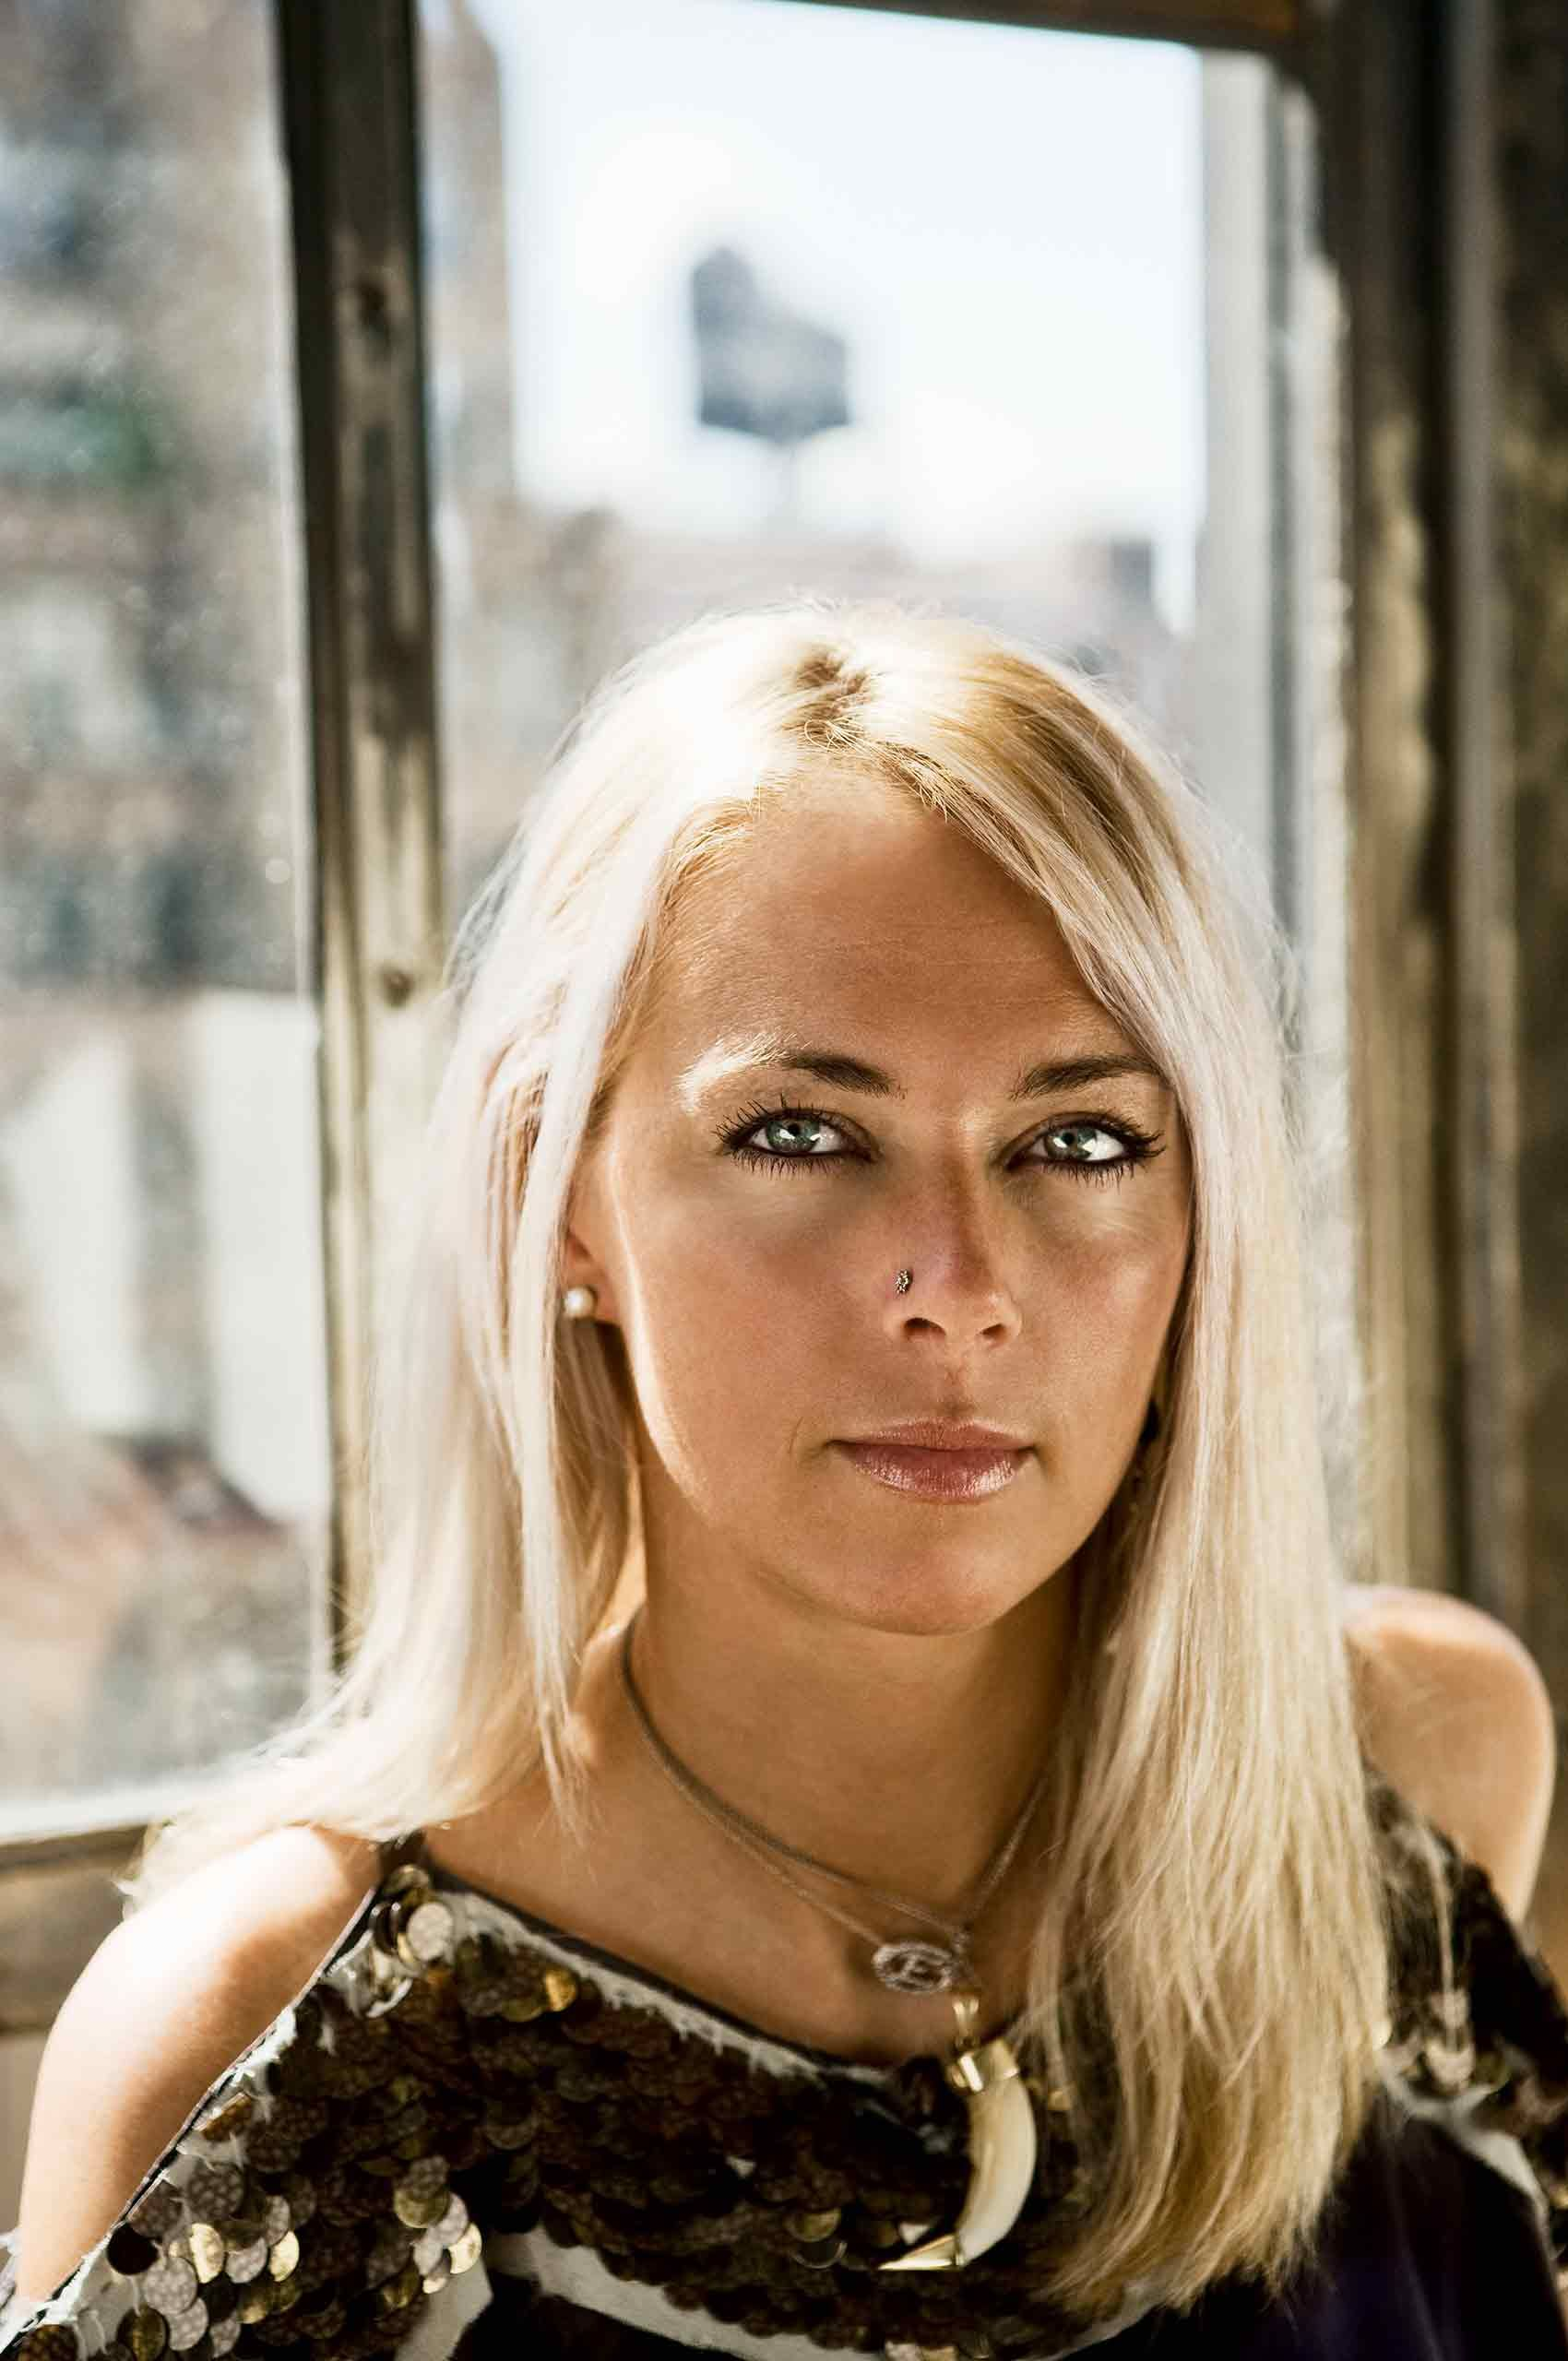 Fashiondesigner-EliseOverland-portrait-closeup-by-HenrikOlundPhotography.jpg